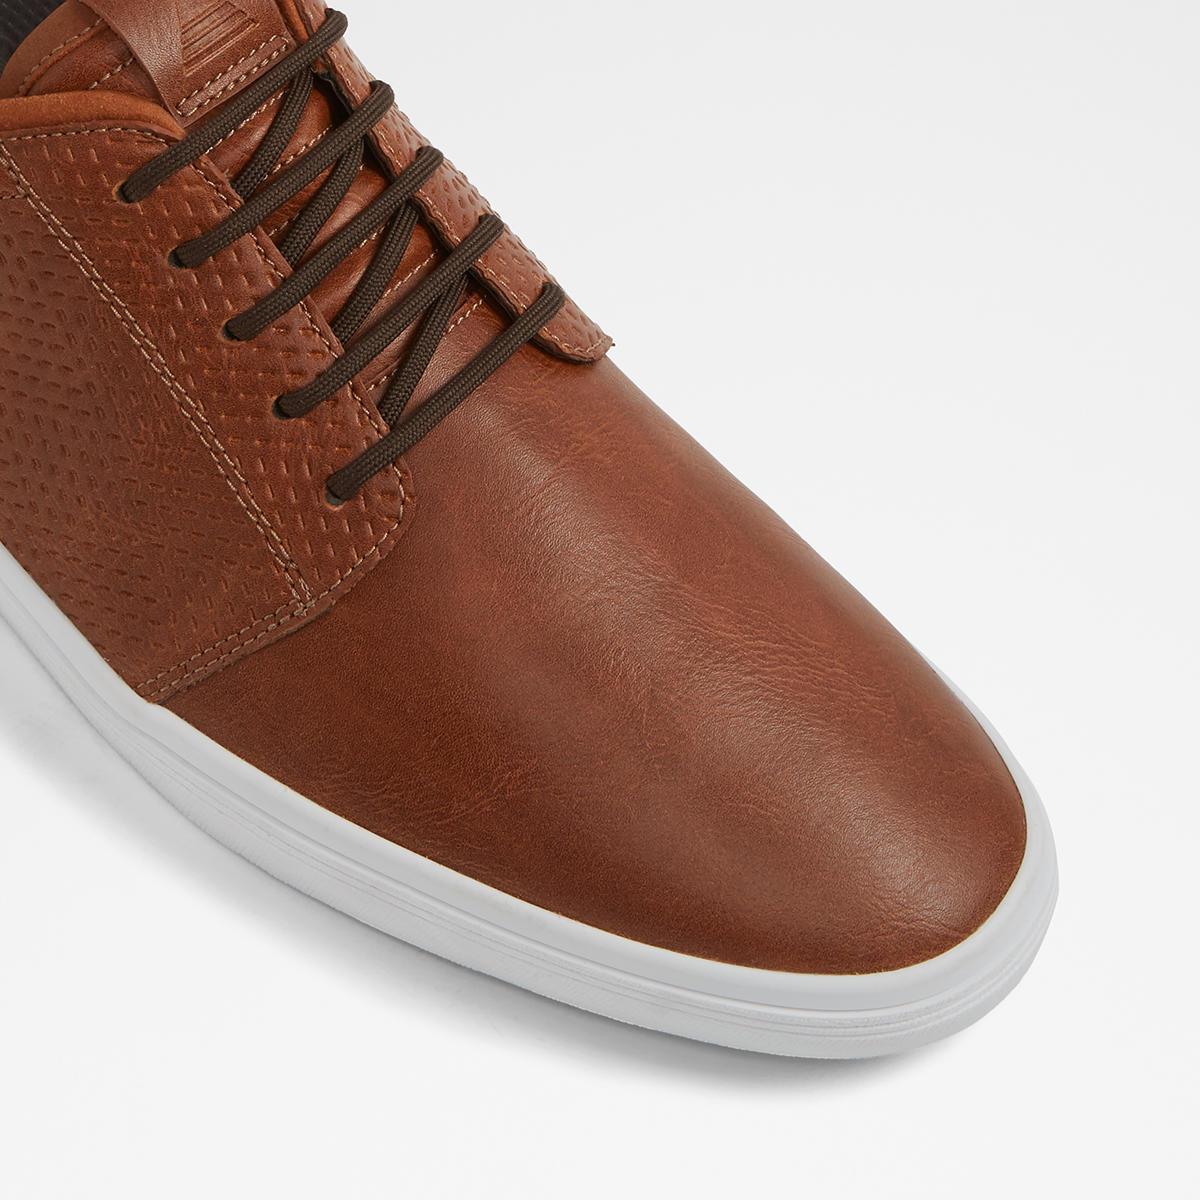 3ff636905f9 Seideman Cognac Men s Sneakers